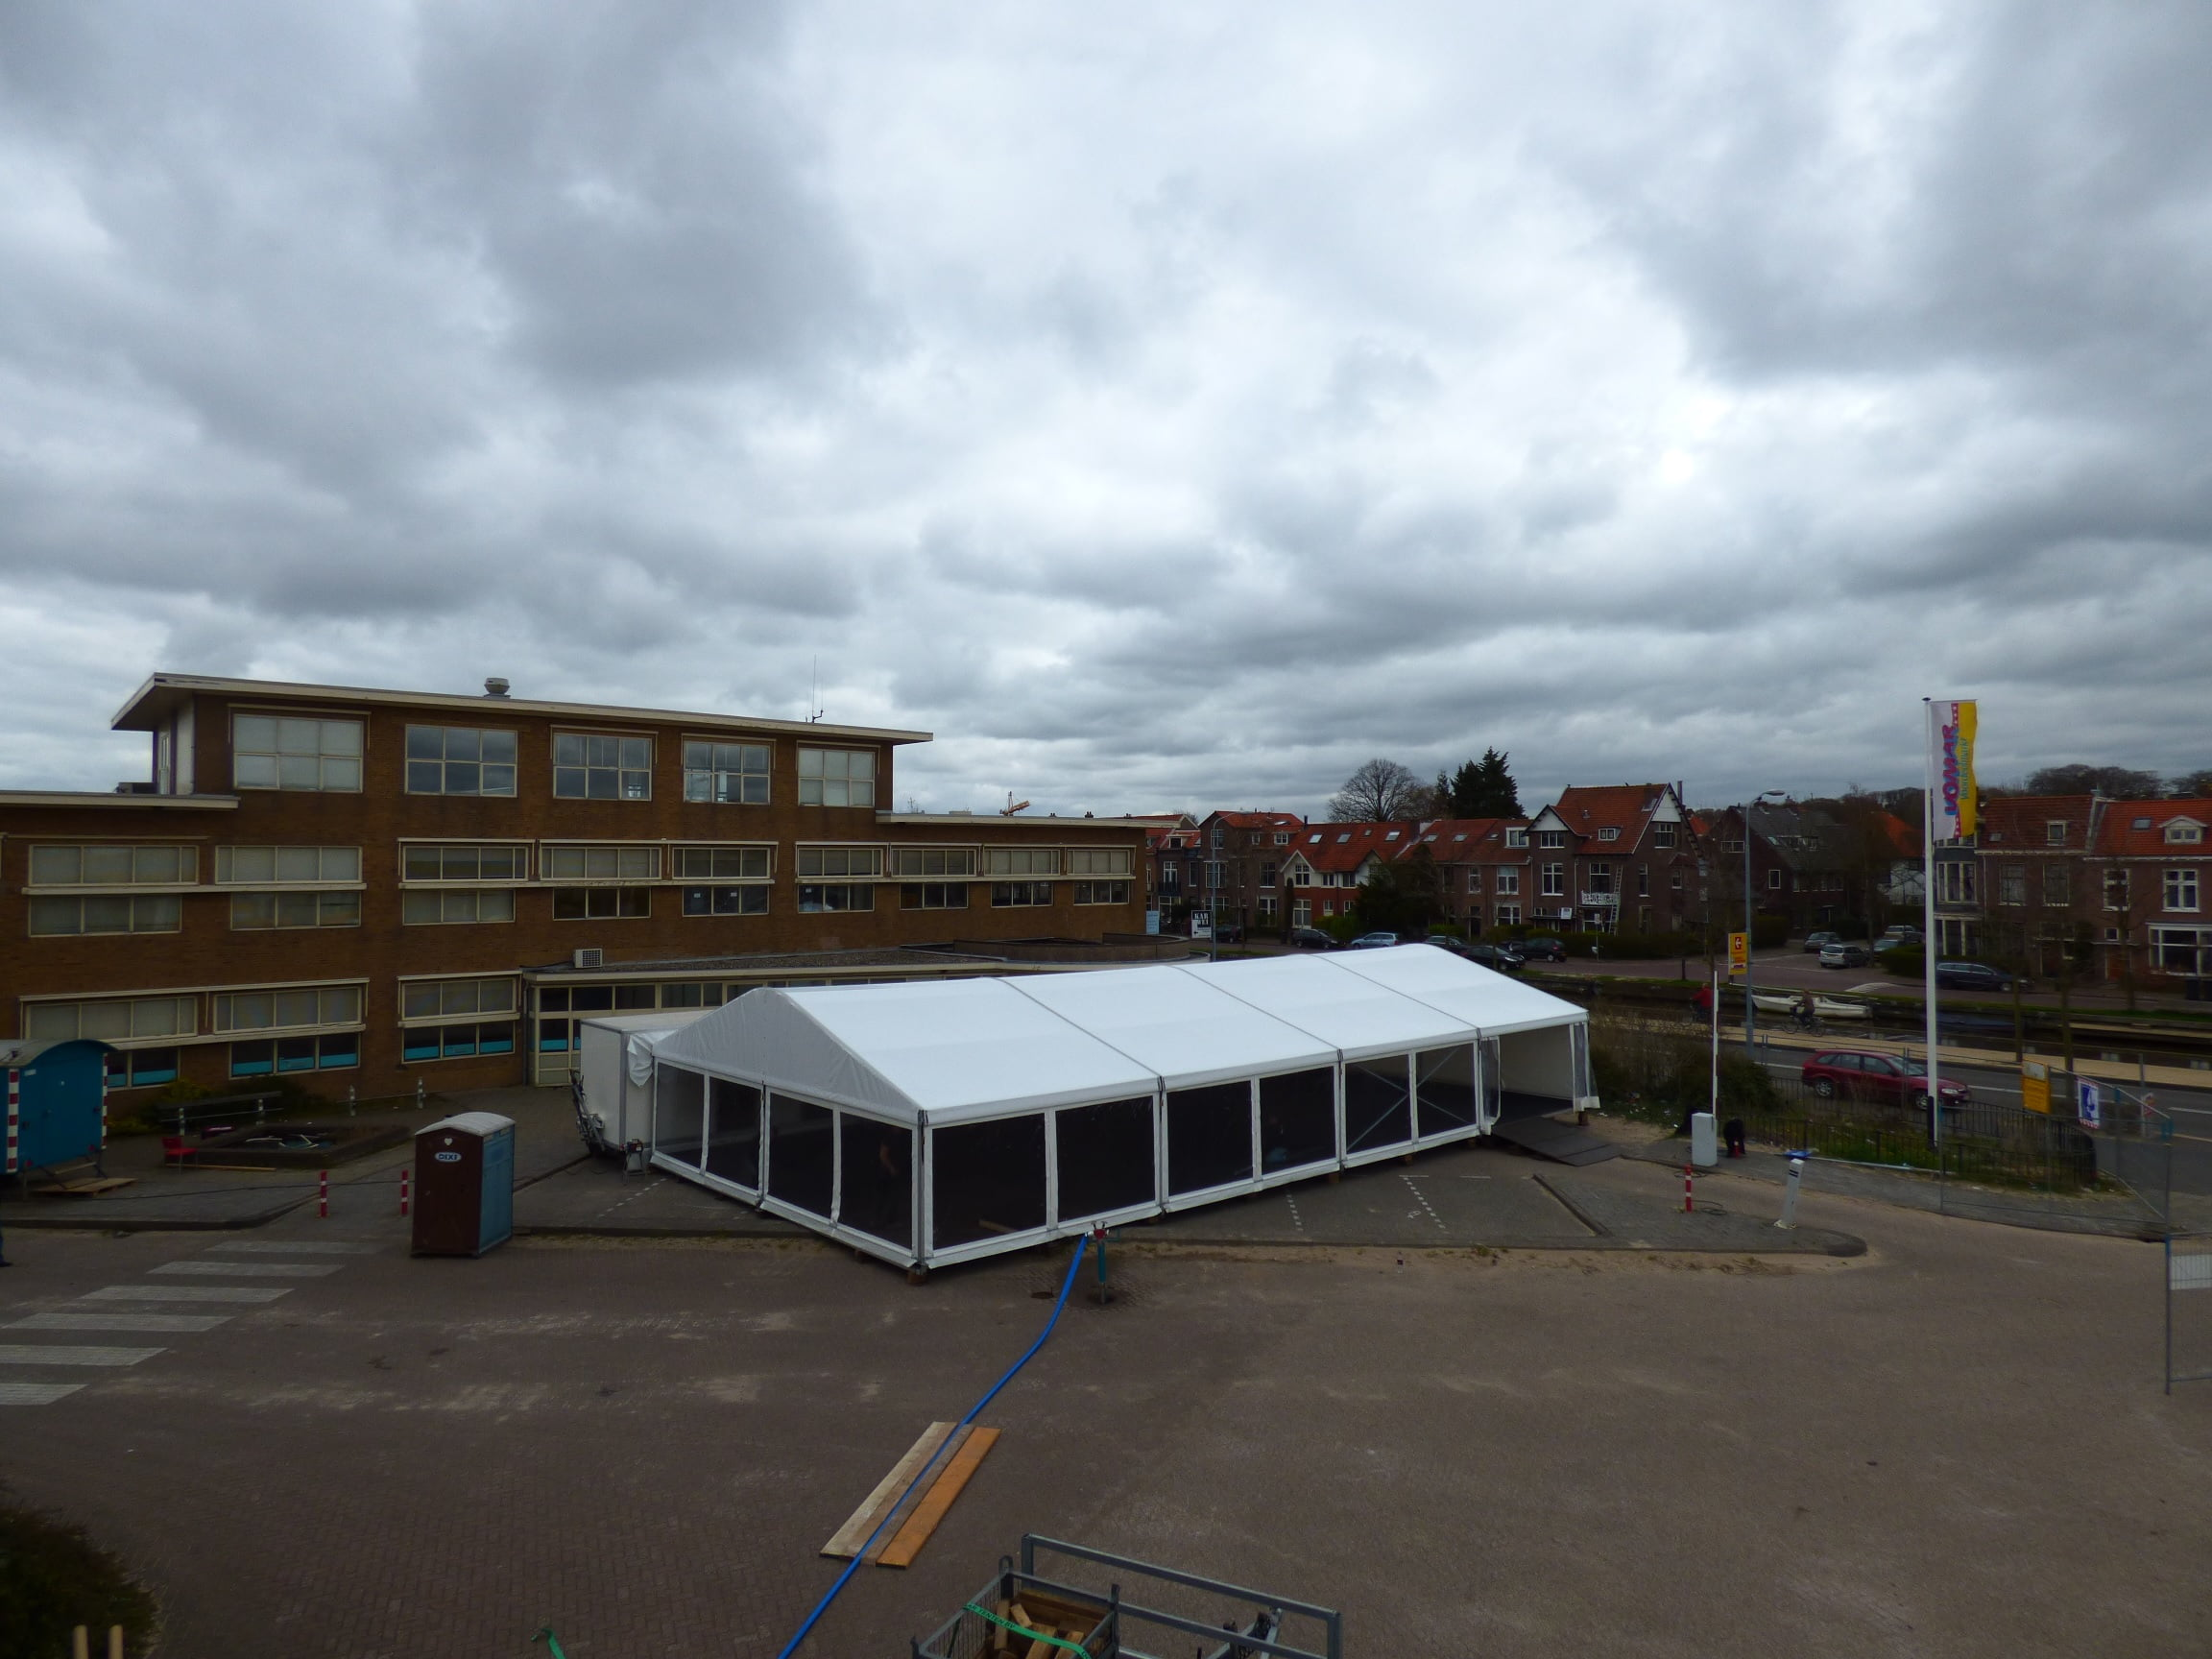 Corona Test Tent